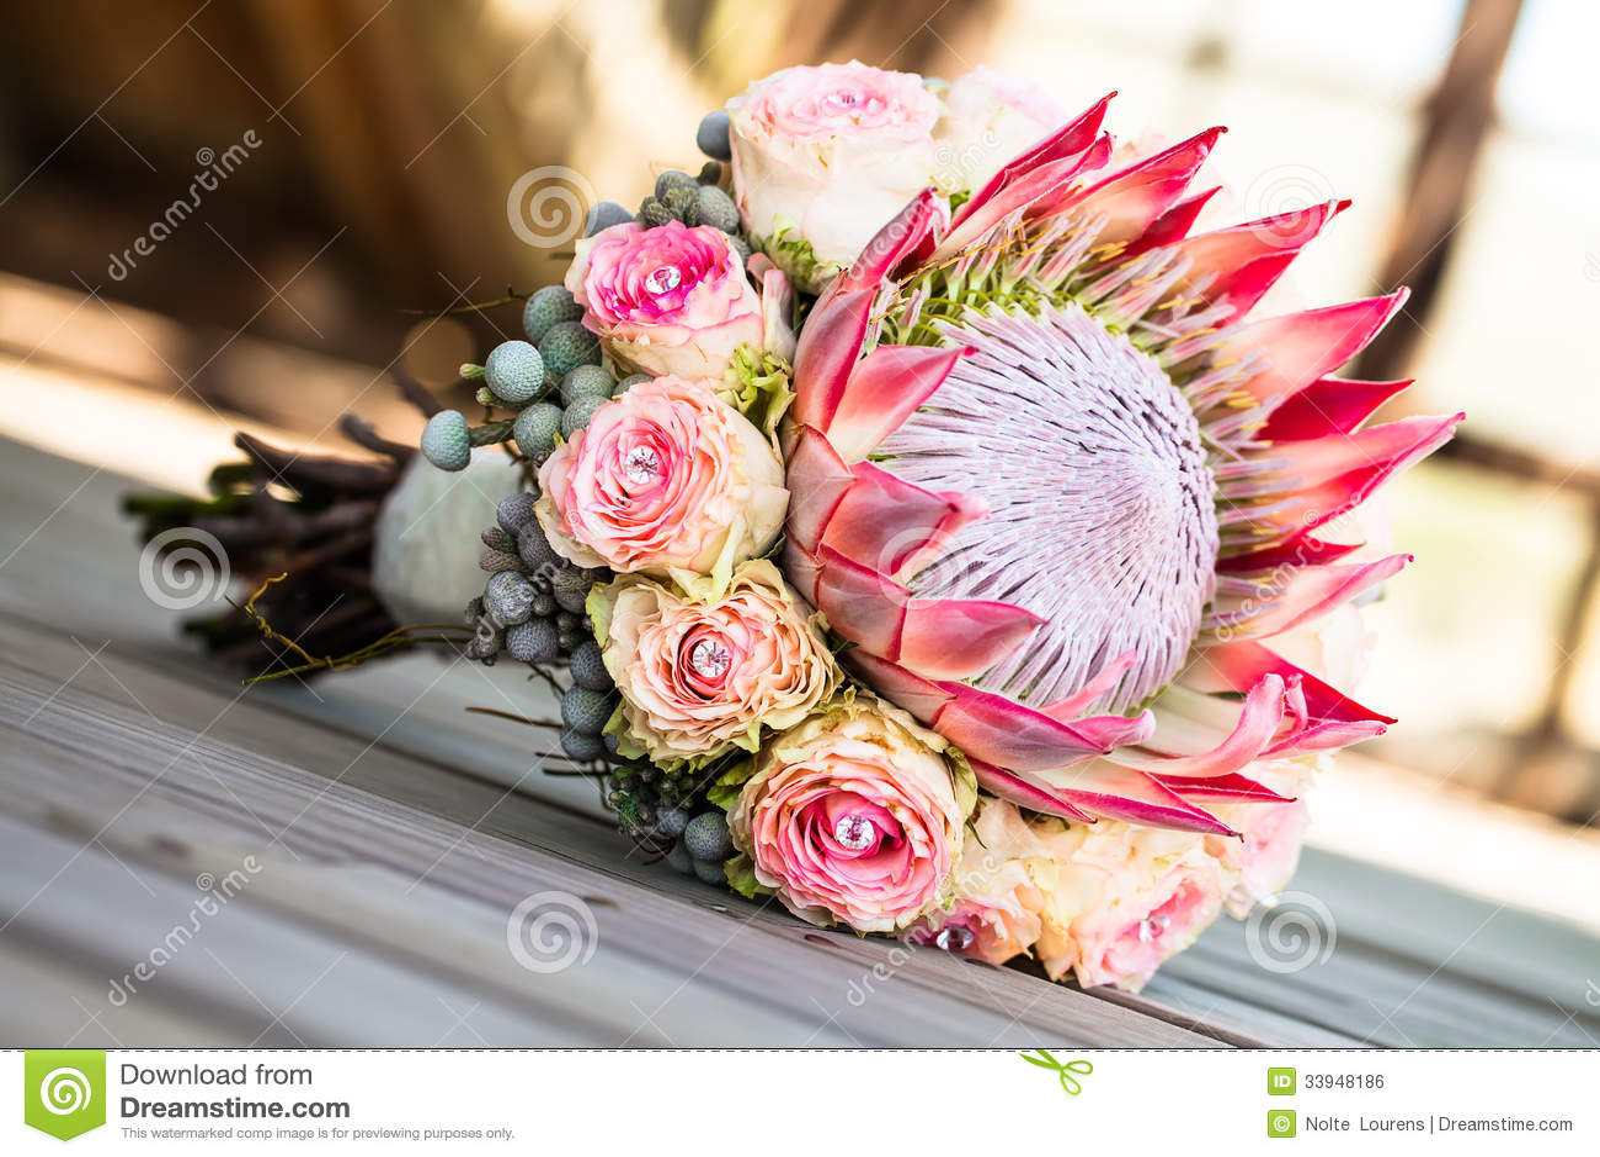 Protea Bouquet Stock Photo Image Of Diamante Roses 33948186